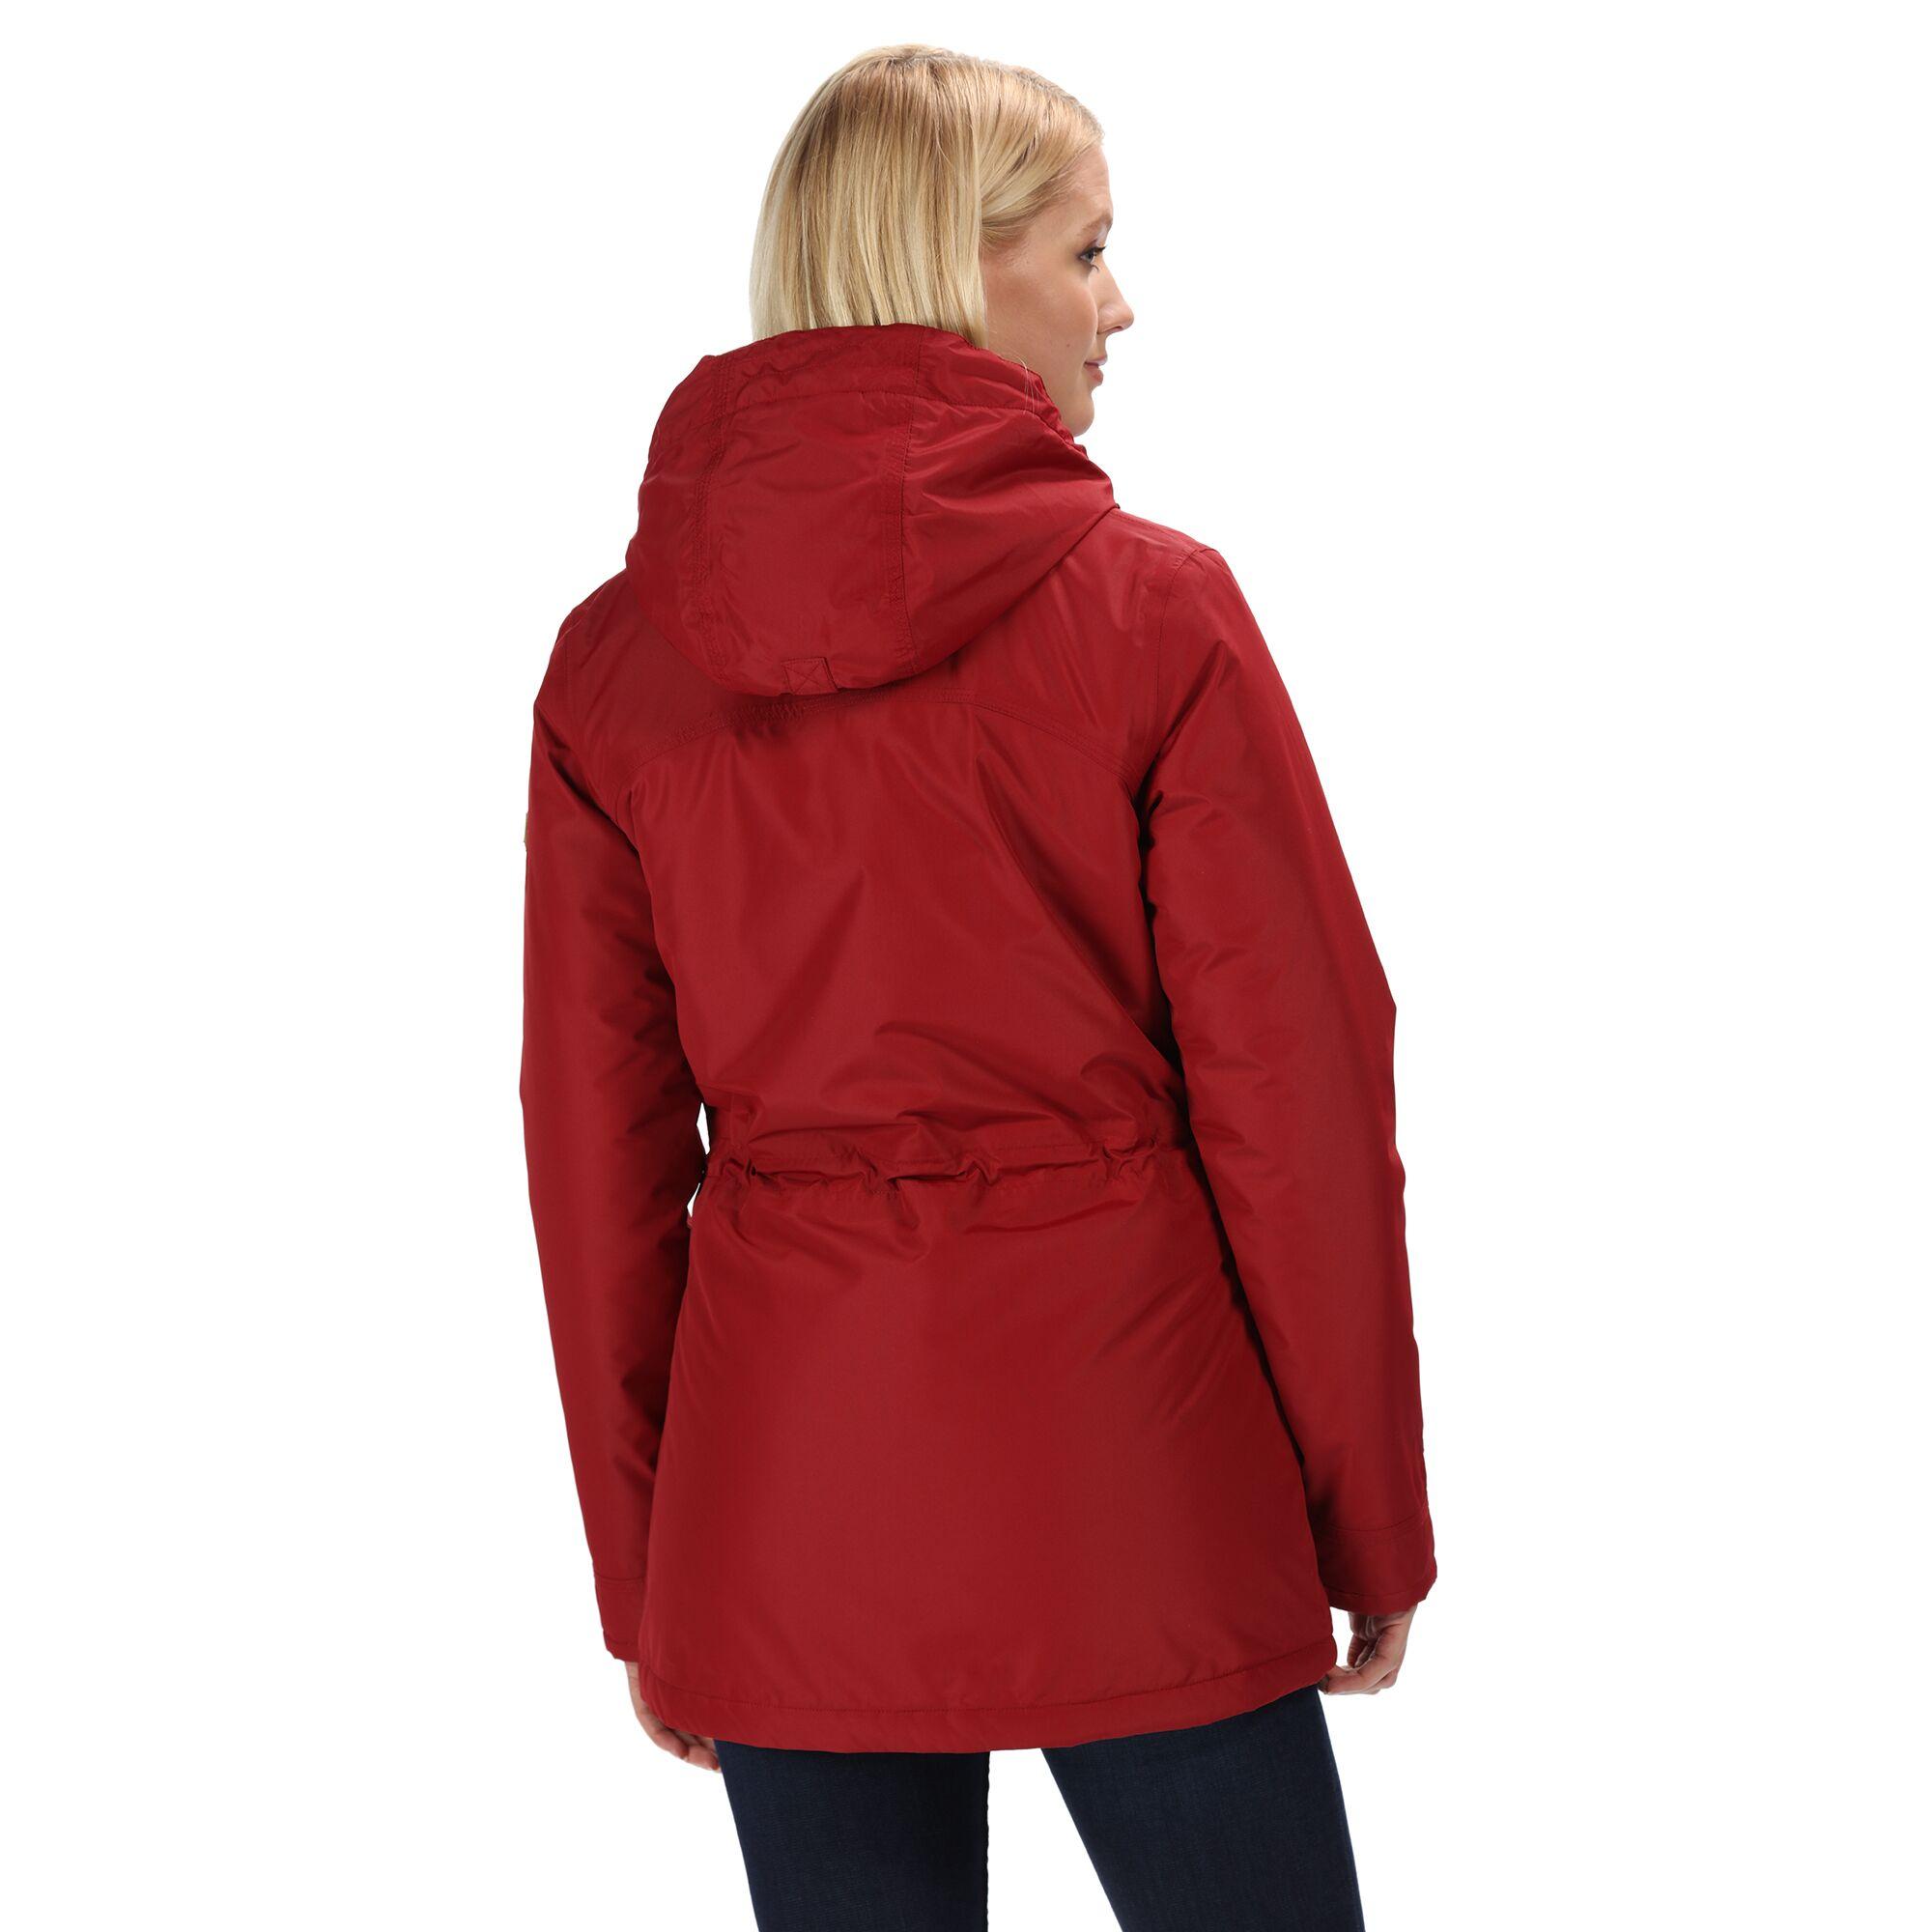 Regatta-Womens-Ladies-Braelynn-Long-Length-Waterproof-Jacket-RG4552 thumbnail 11